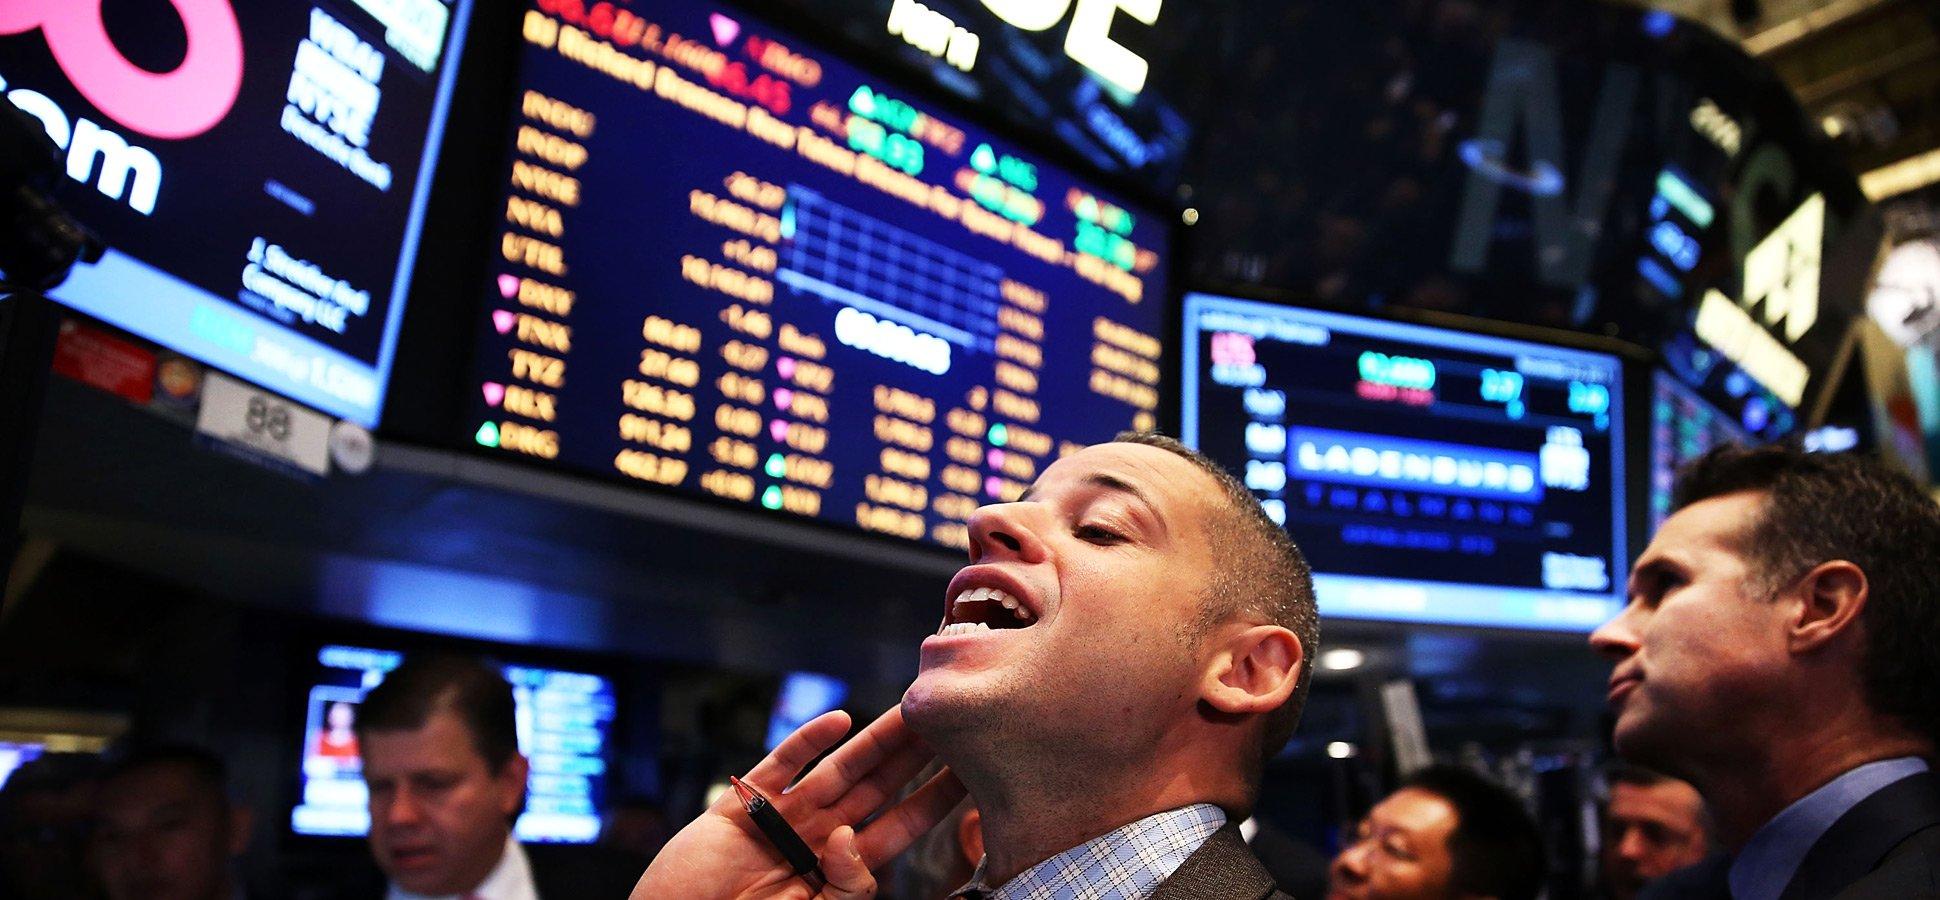 IPOs Shine, But Entrepreneurs Turn Down Mergers